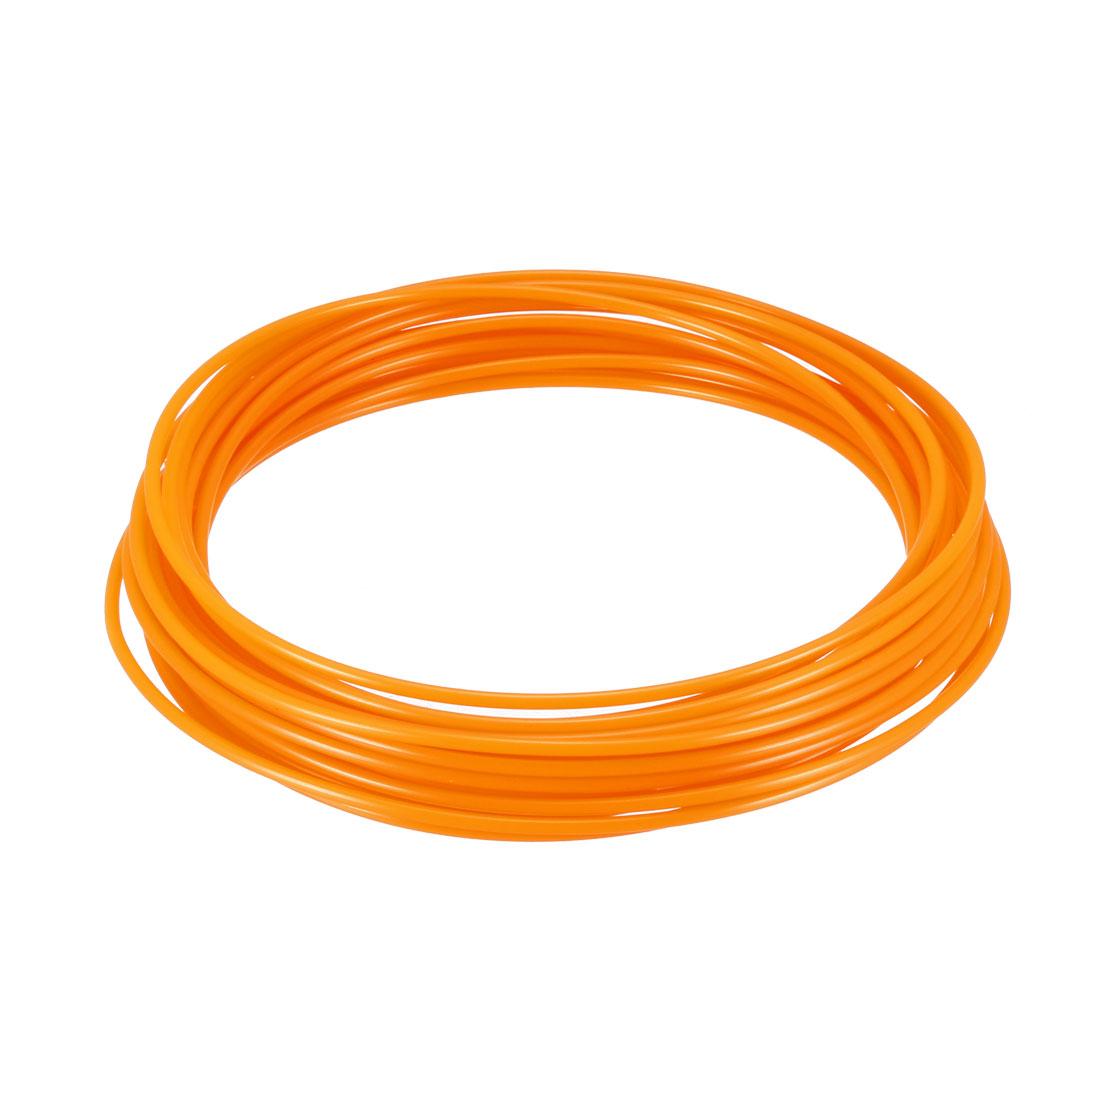 5 Meter/16 Ft PLA 3D Pen/3D Printer Filament, 1.75 mm Fluorescent Orange